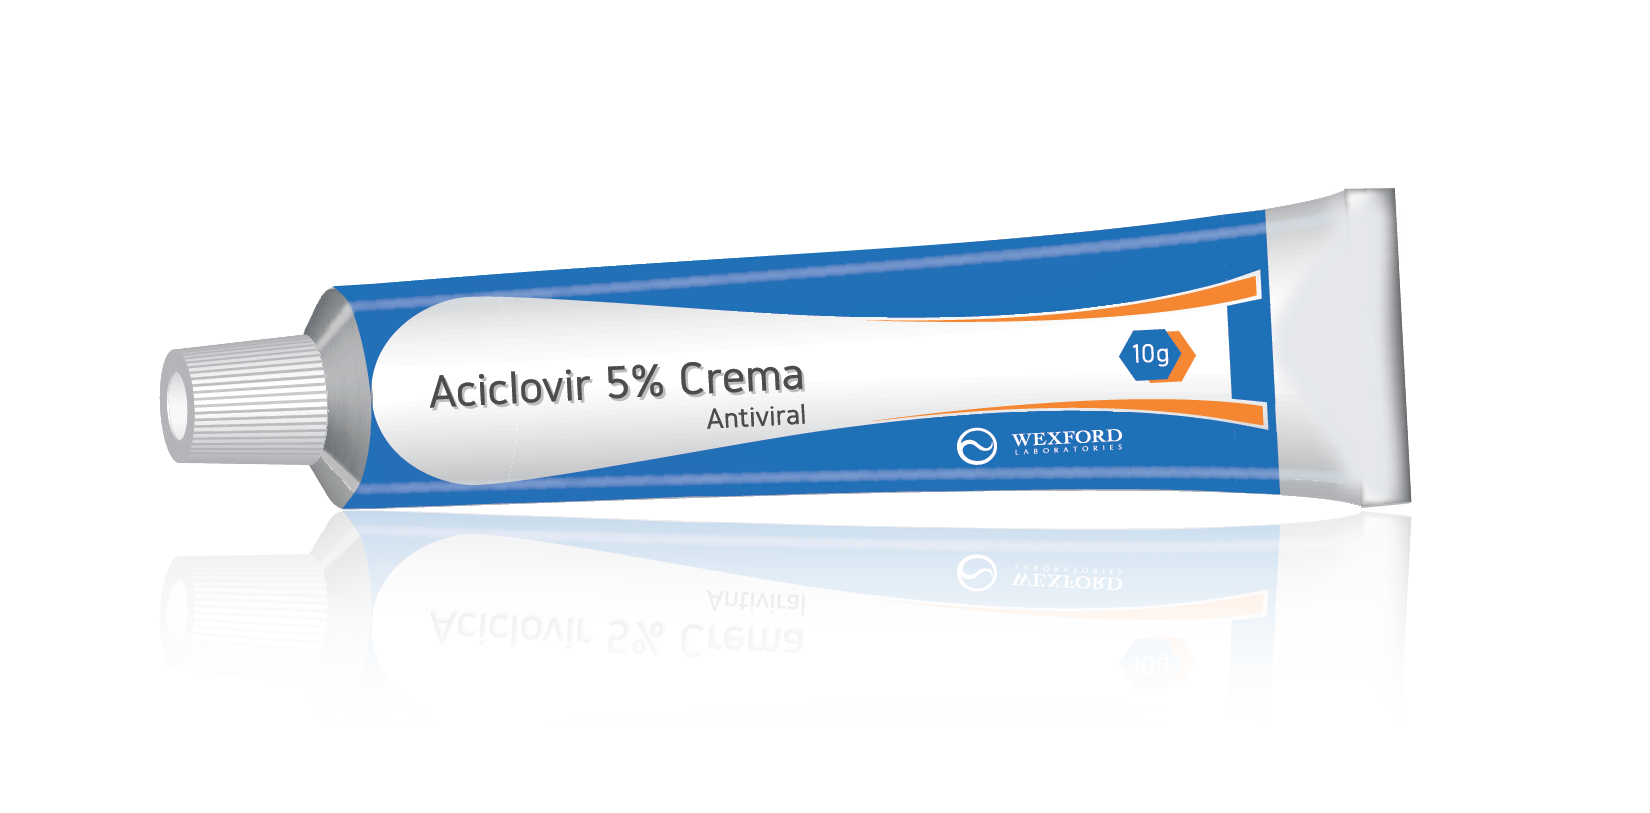 Nuevo Producto – Aciclovir Crema 5%